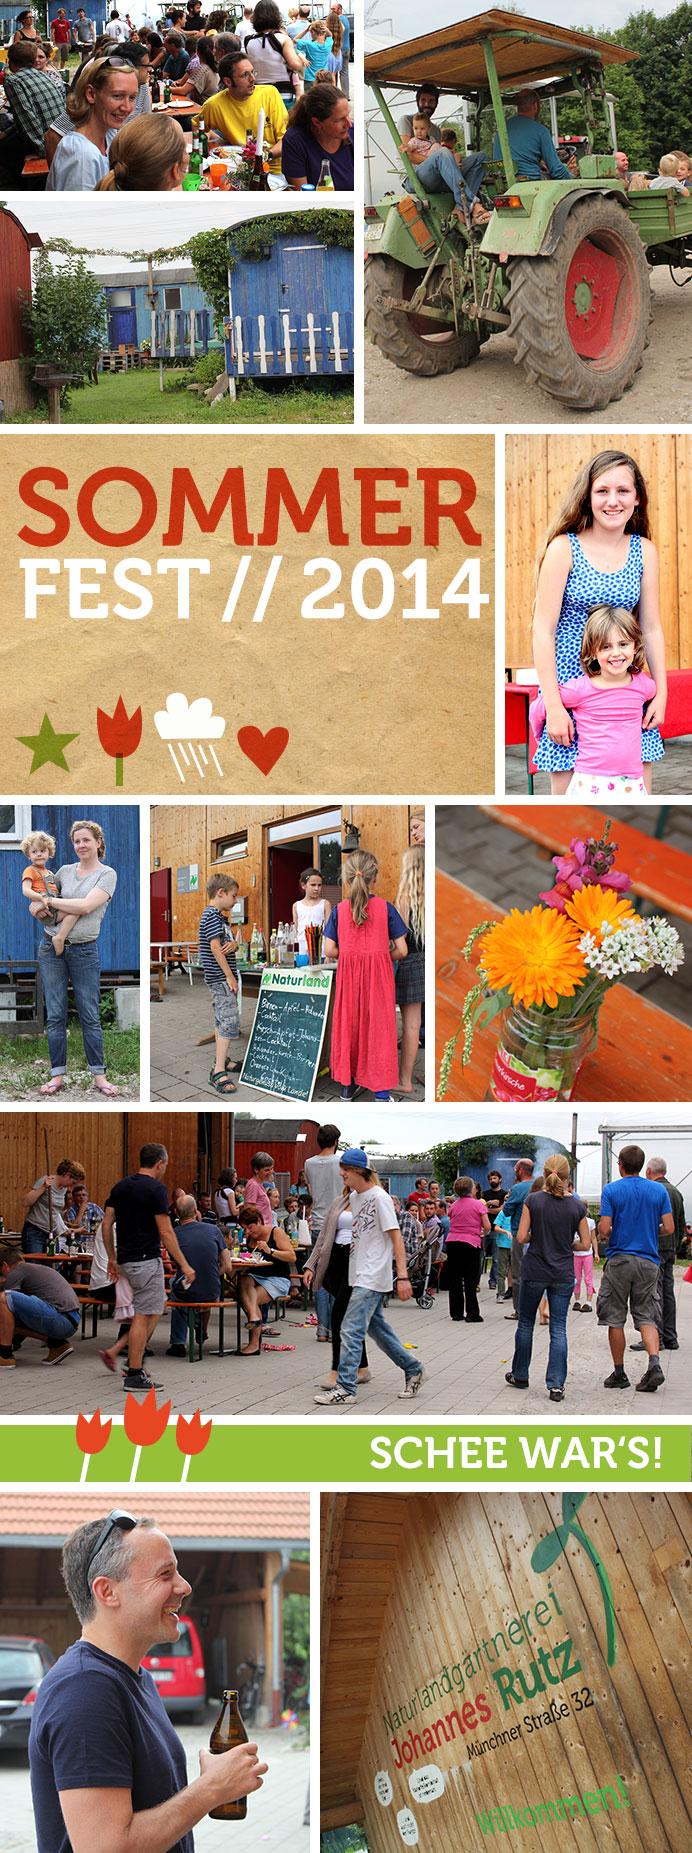 Sommerfest_collage_2014